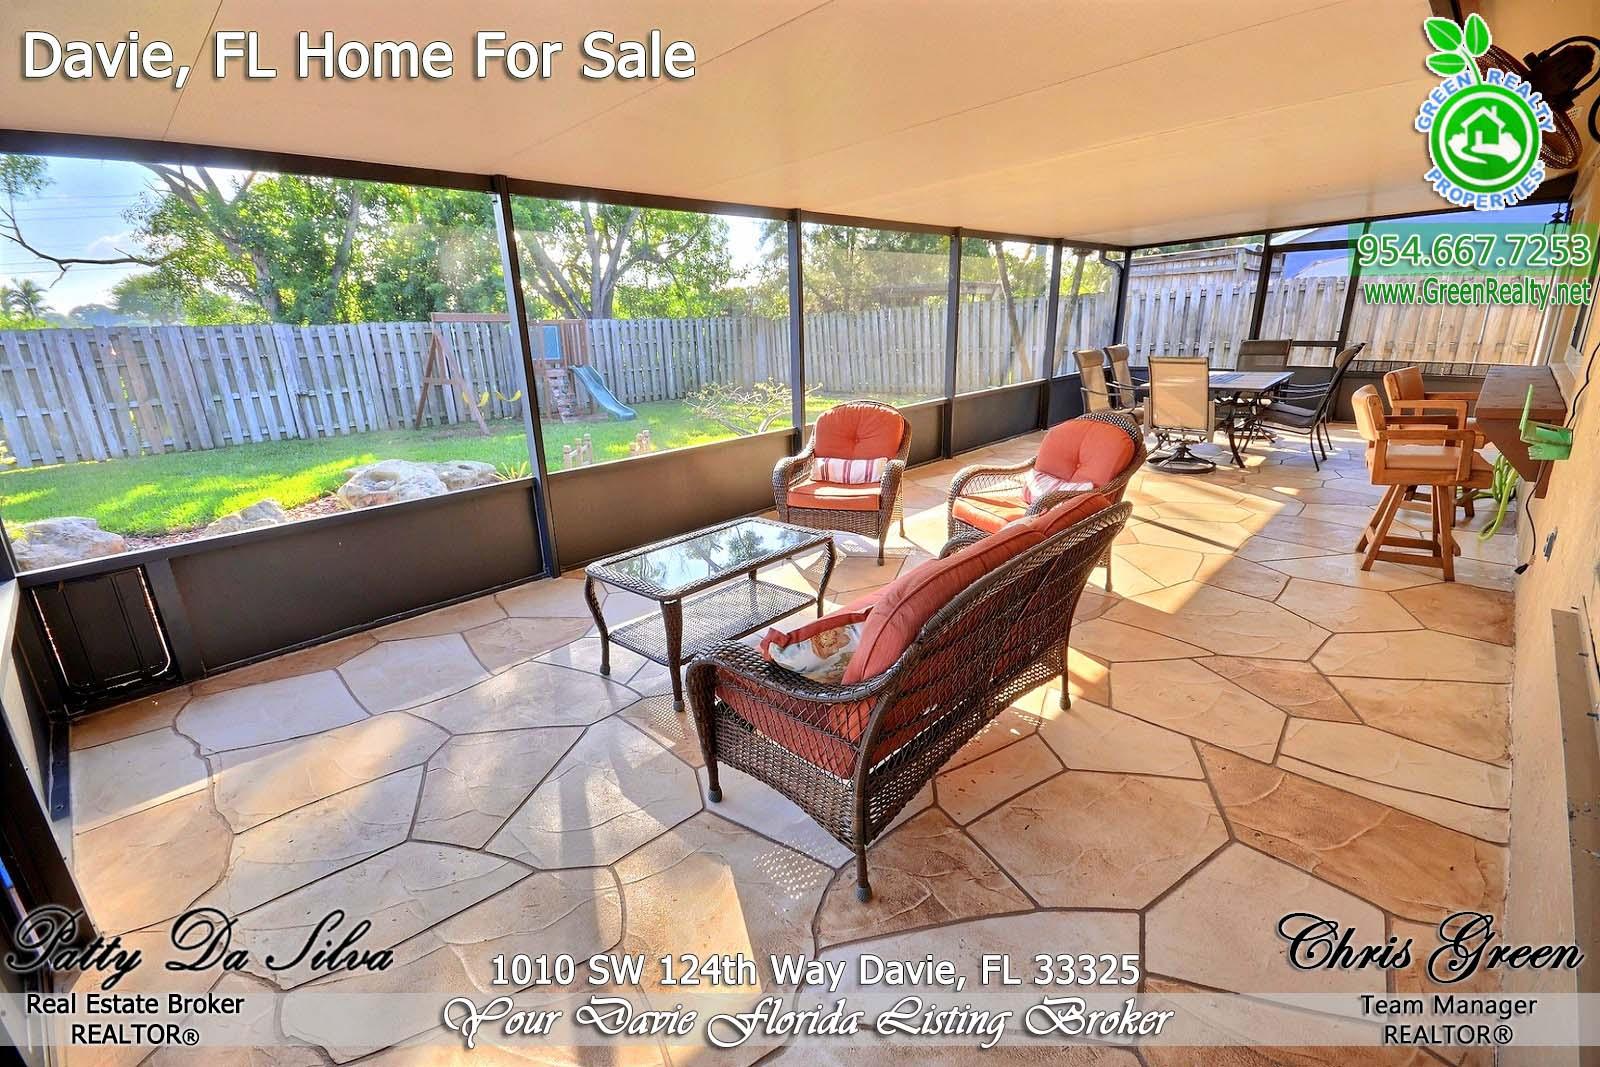 27 Davie Real Estate For Sale (2)